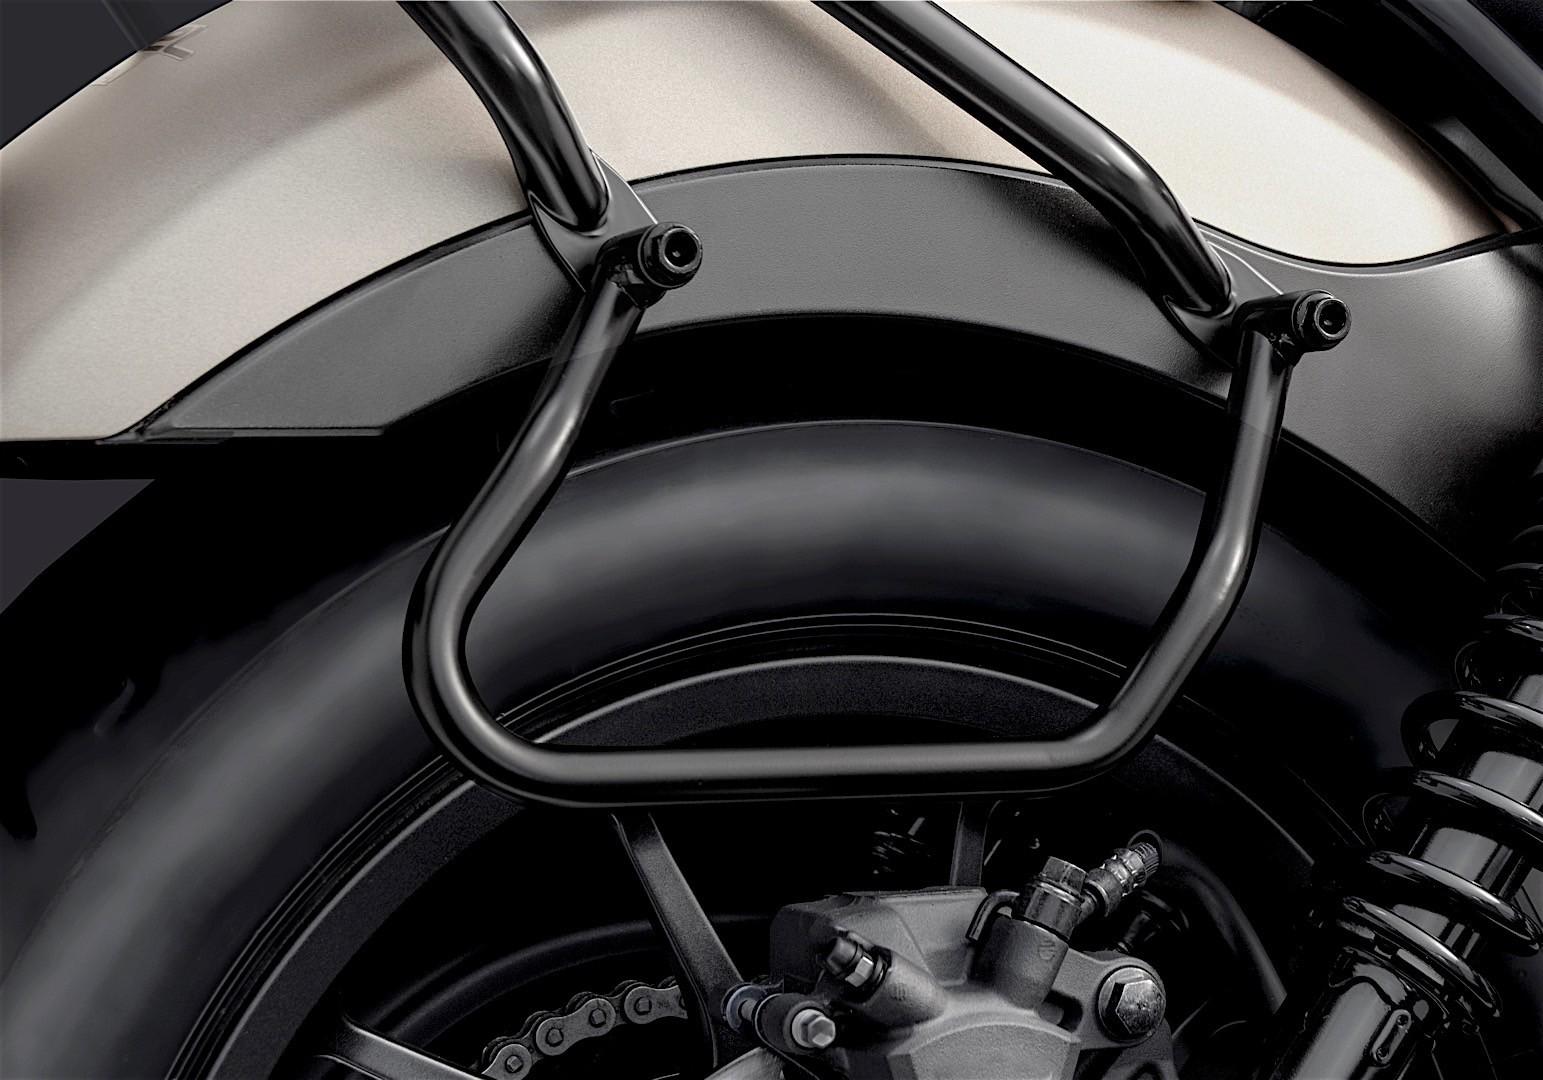 Recalls Honda Com >> Honda Unveils New Rebel 500 for 2017 - autoevolution